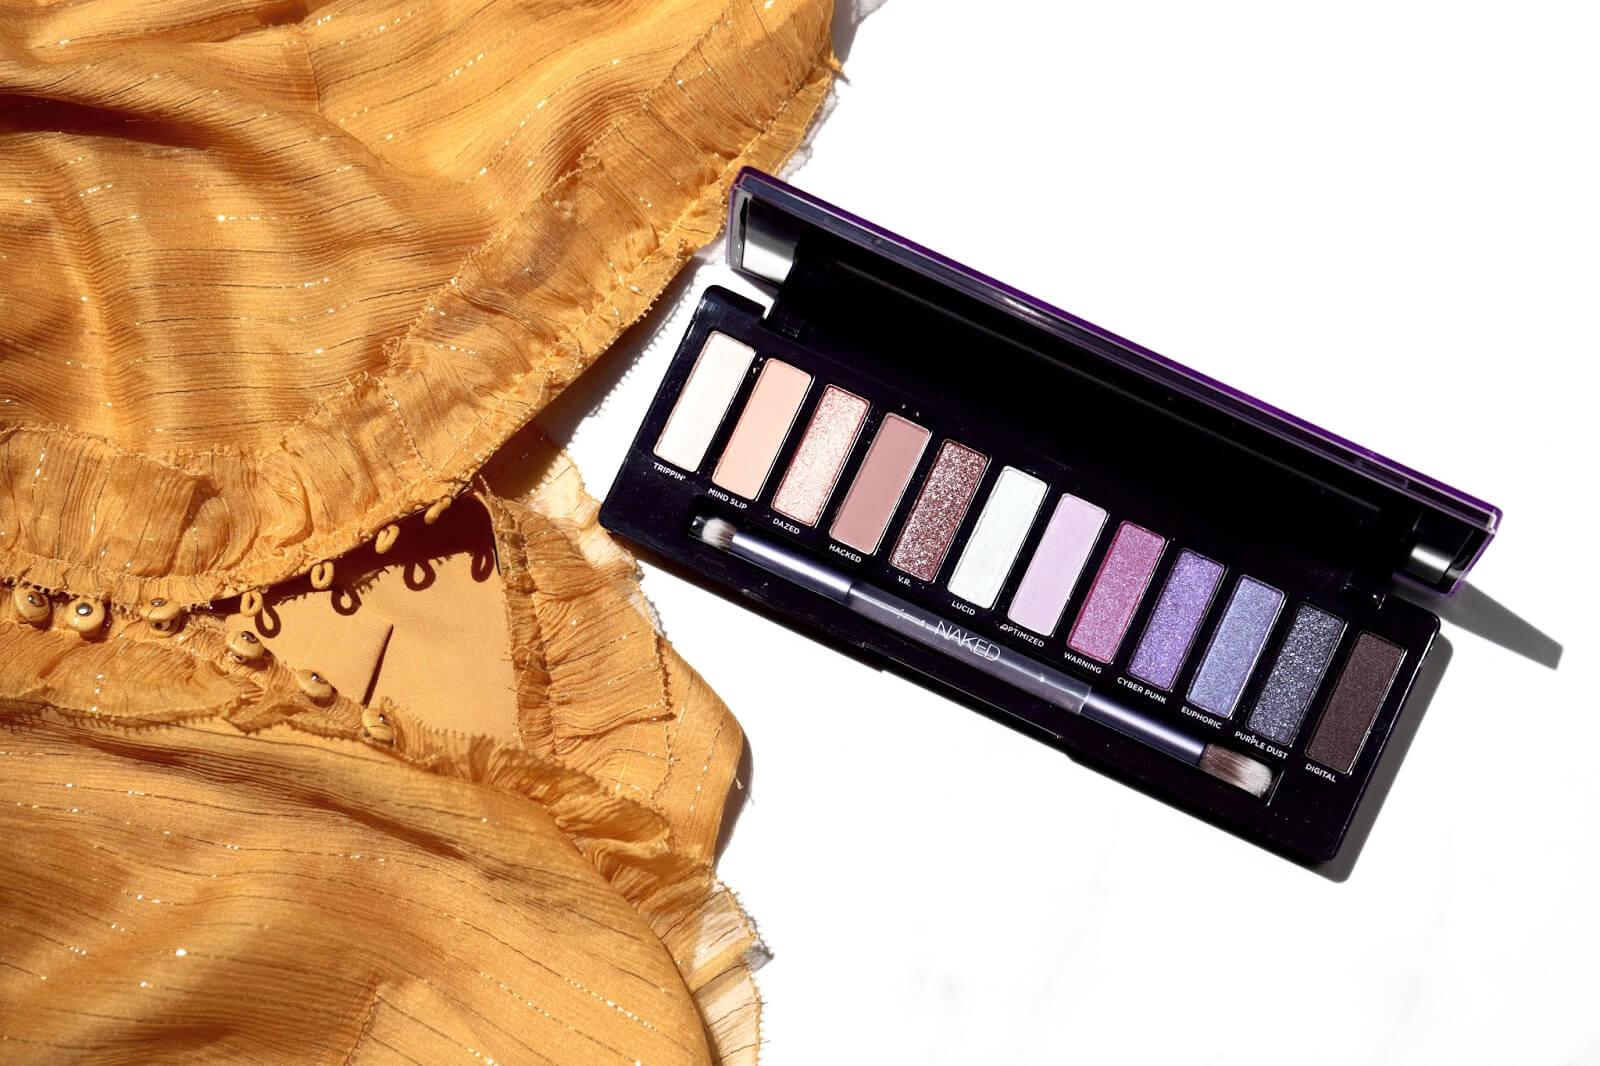 Naked Ultra Violet Palette swatch